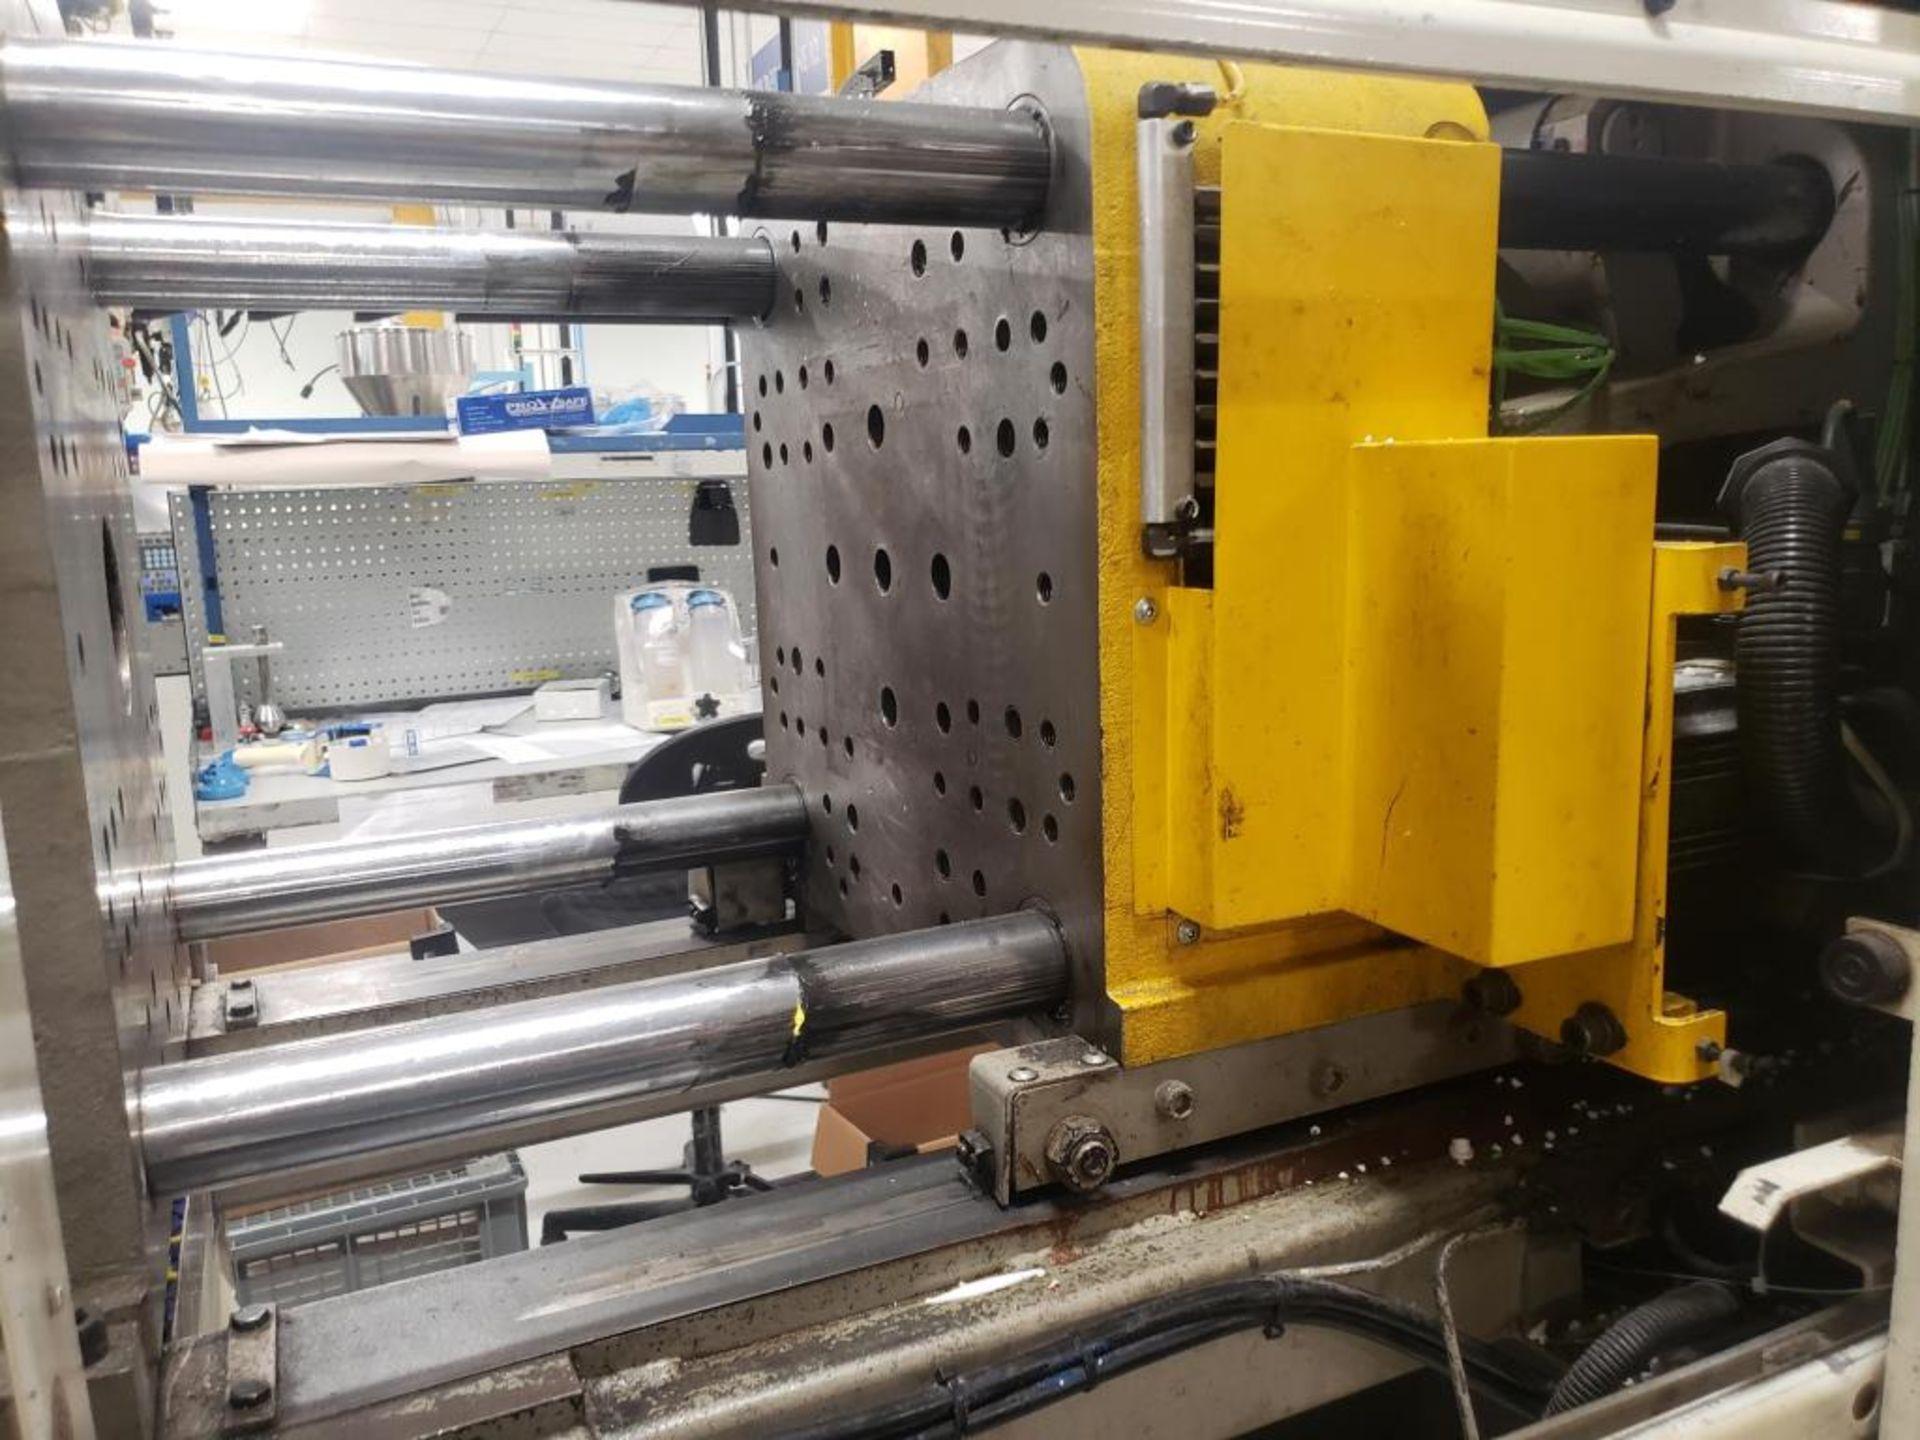 Injection Molding Machine - Image 4 of 7